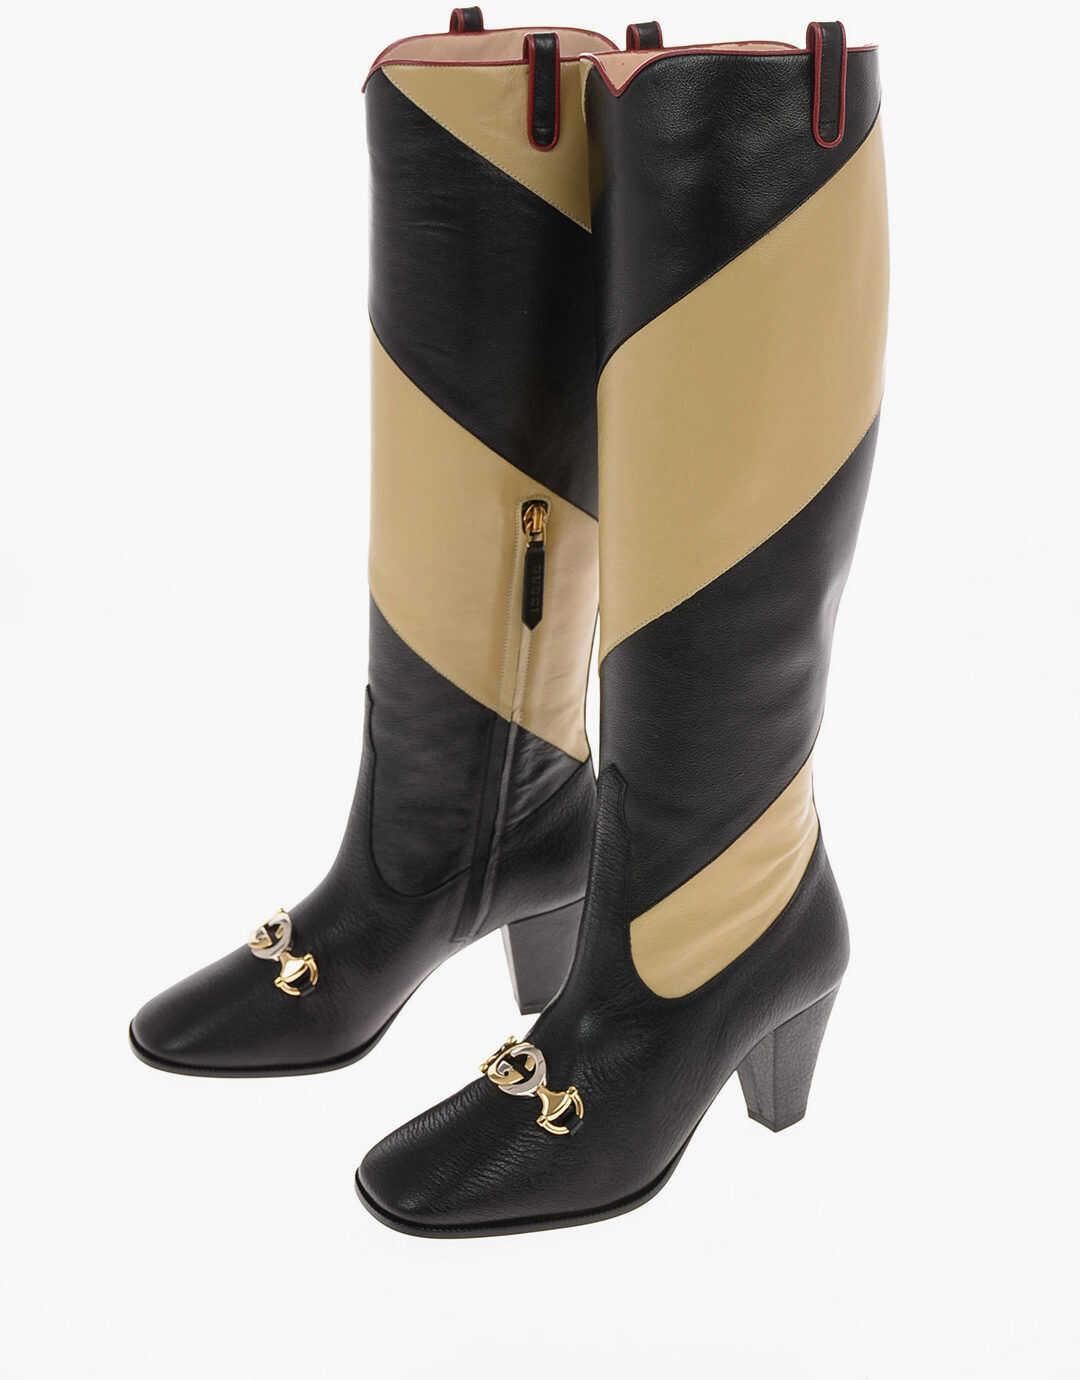 Gucci 7.5 cm leather two tones Boots BLACK imagine b-mall.ro